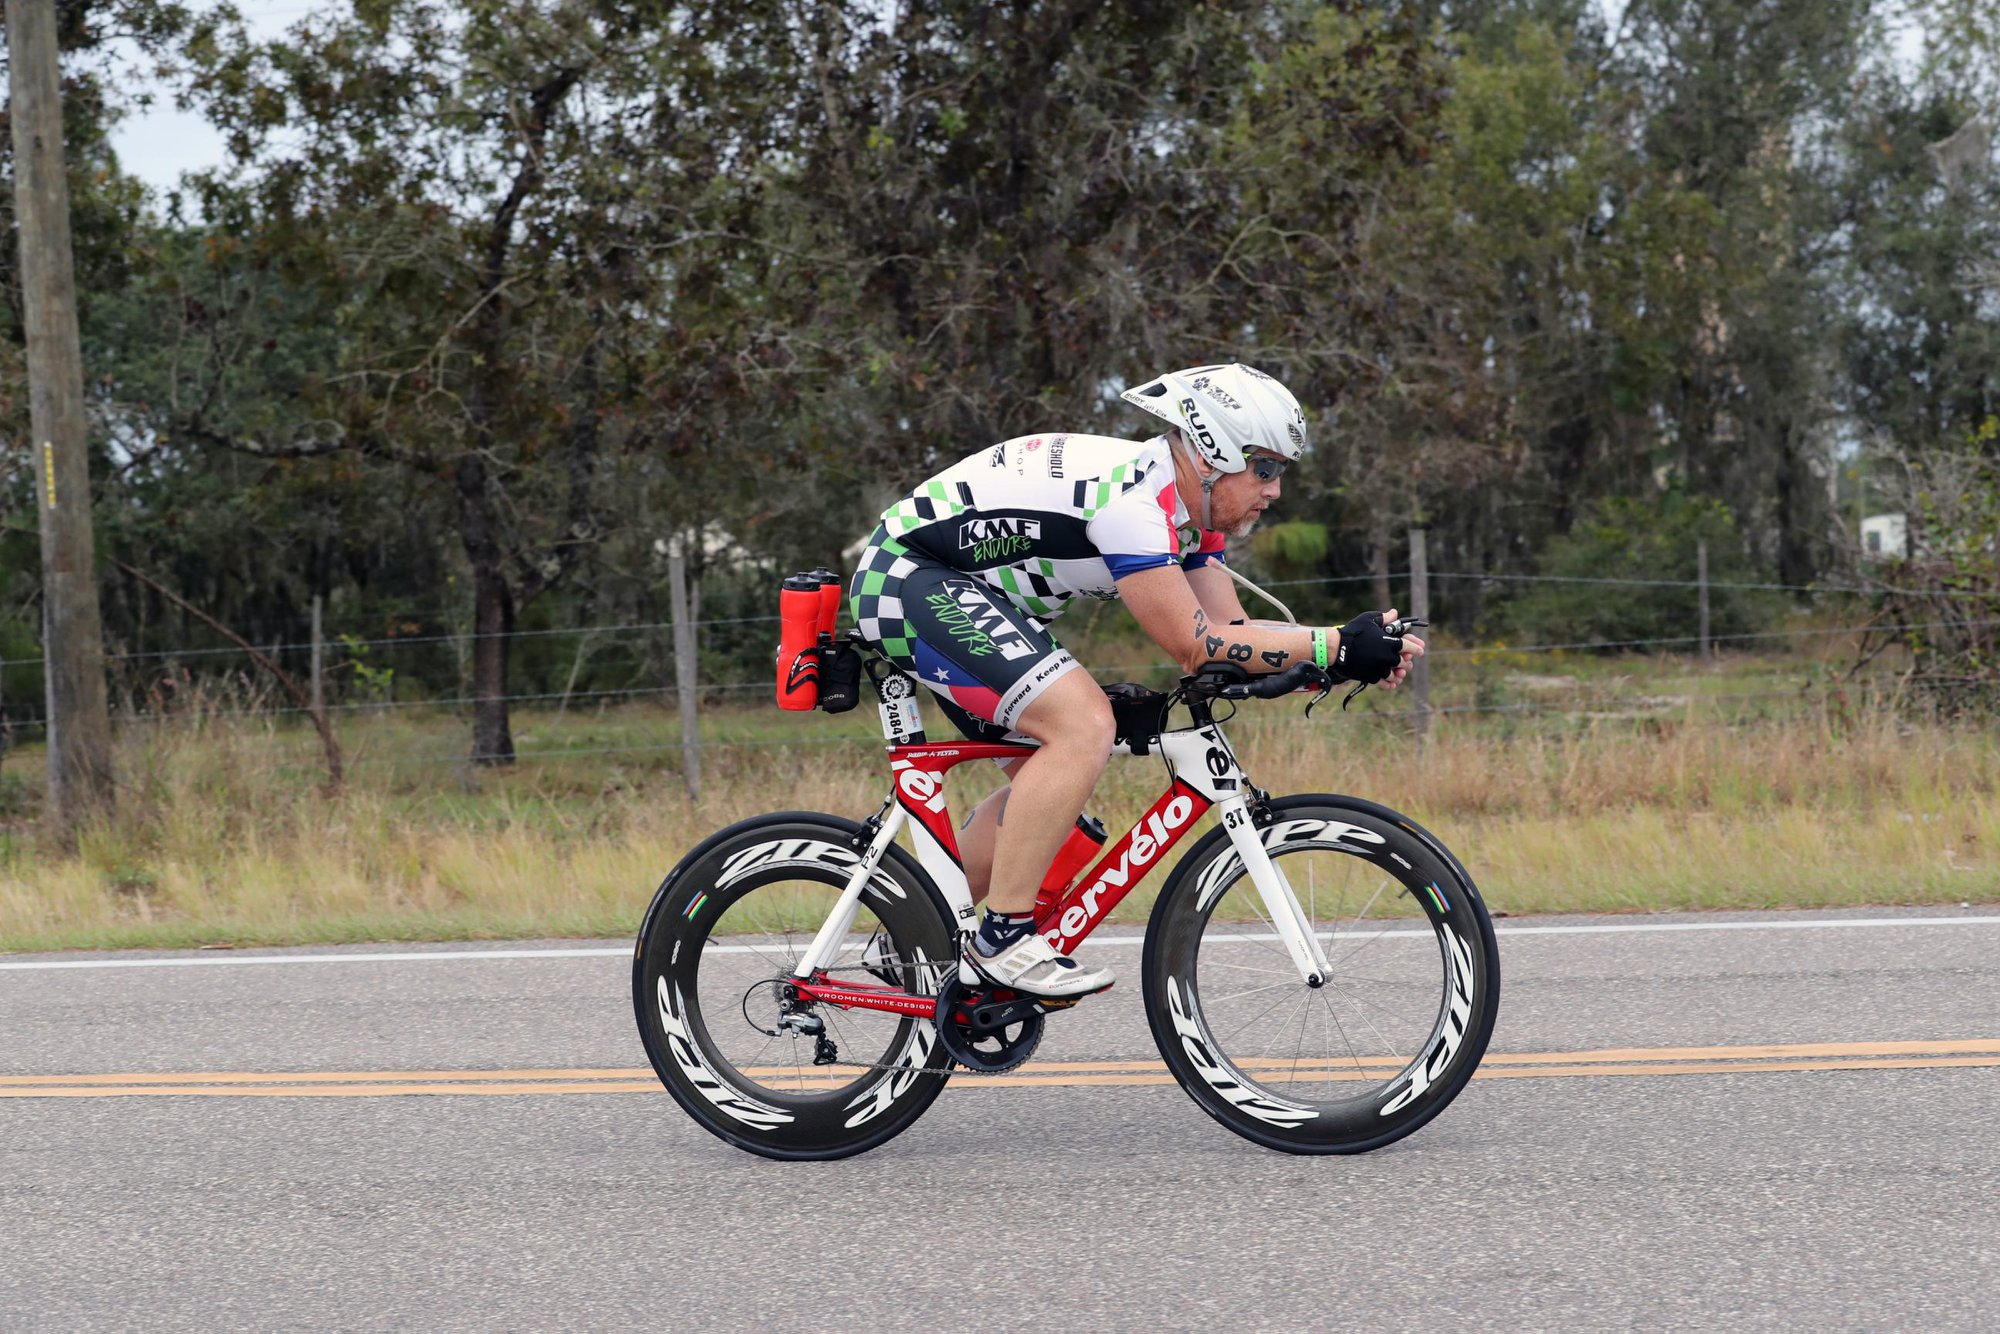 Coach_Terry_Wilson_Pursuit_of_The_Perfect_Race_IRONMAN_Florida_Jeff_Allen_2.jpg